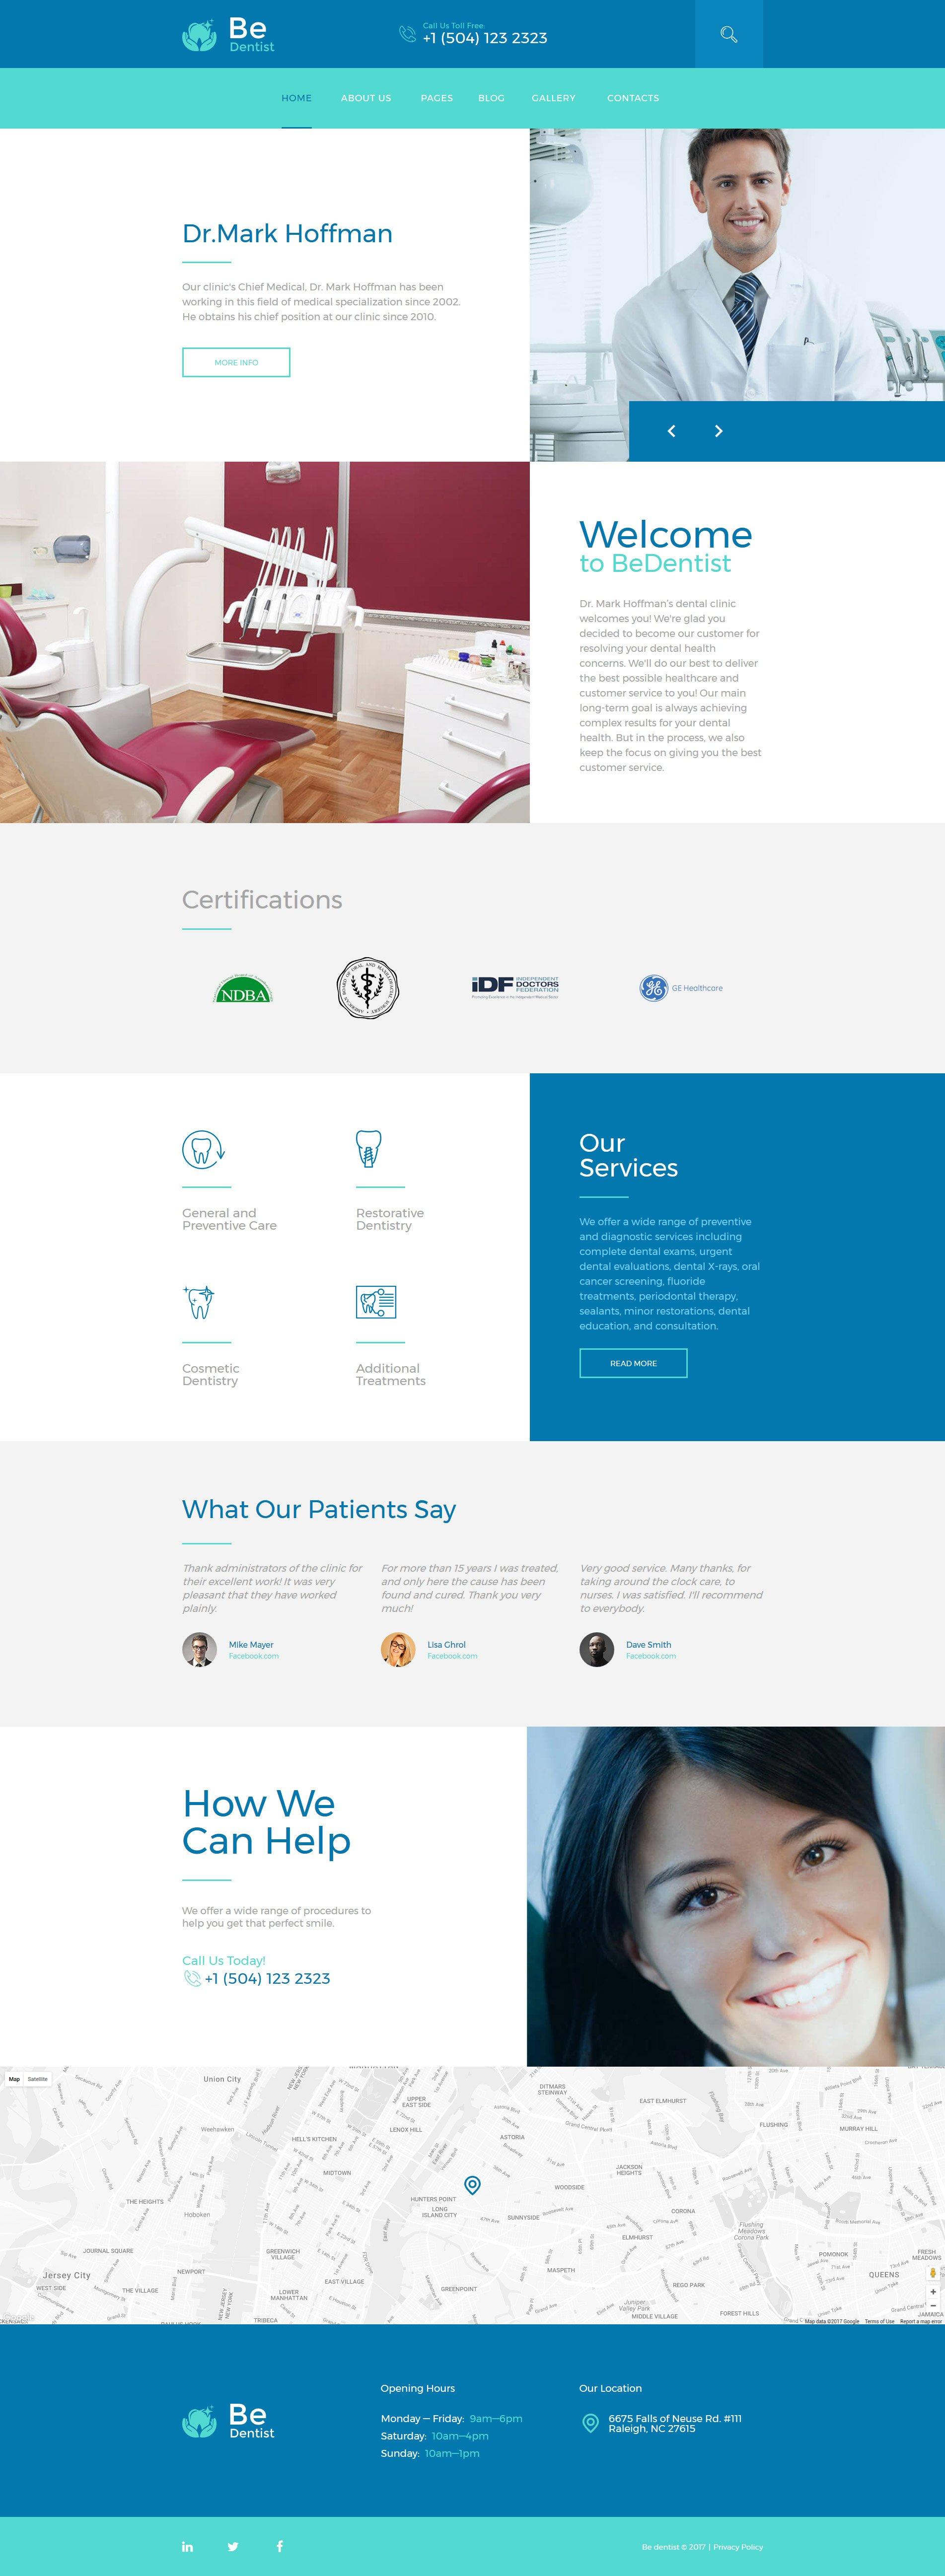 Responsywny szablon Joomla BeDentist - klinika dentystyczna #58449